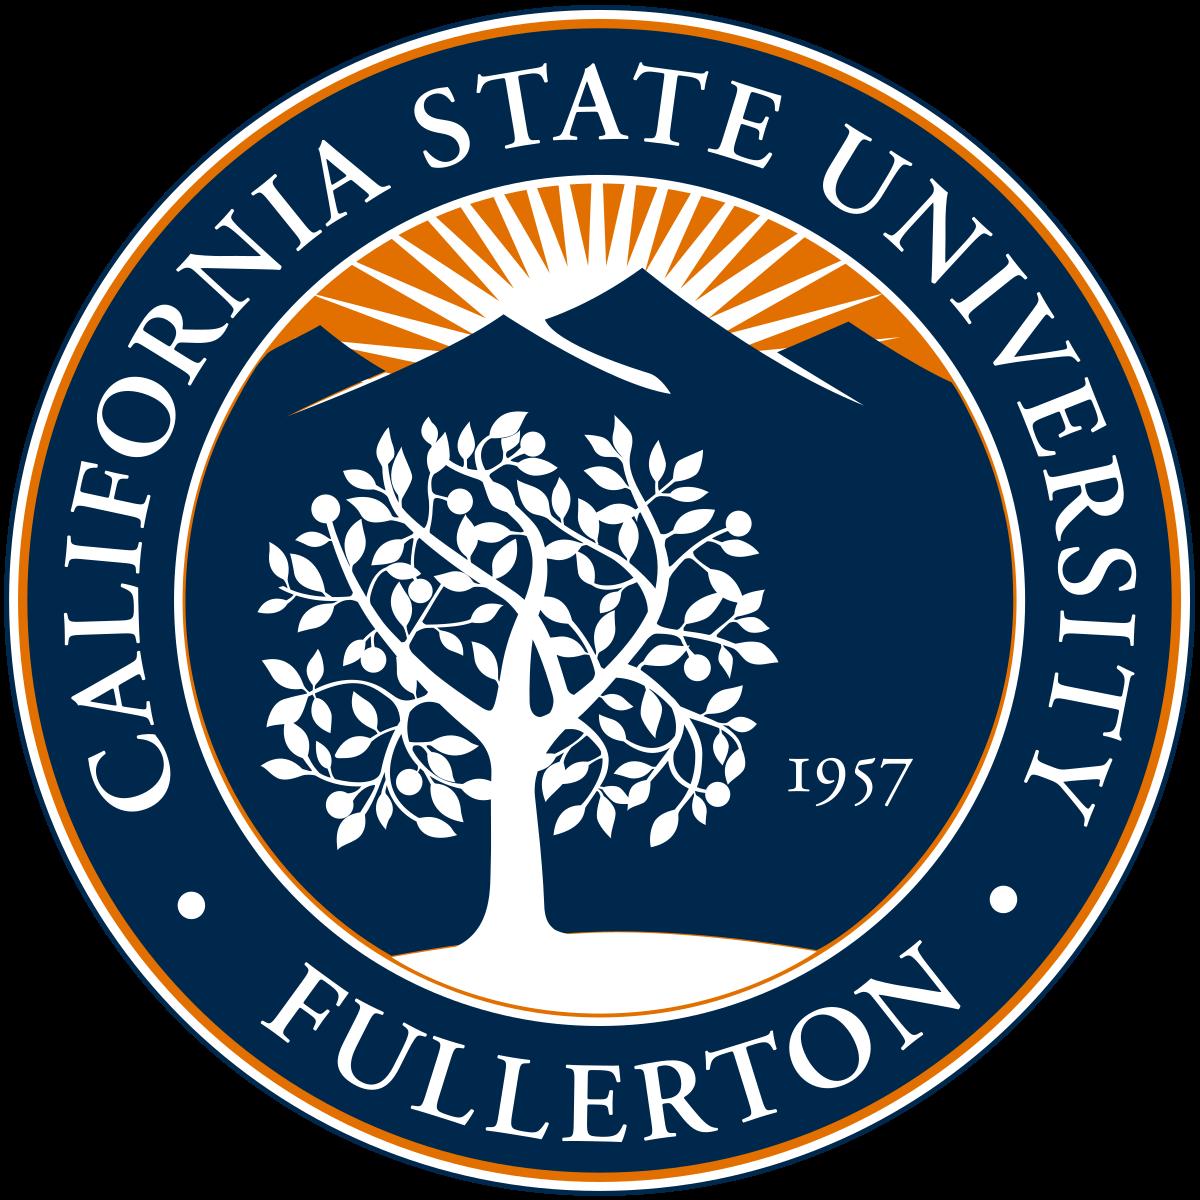 California State University, Fullerton.